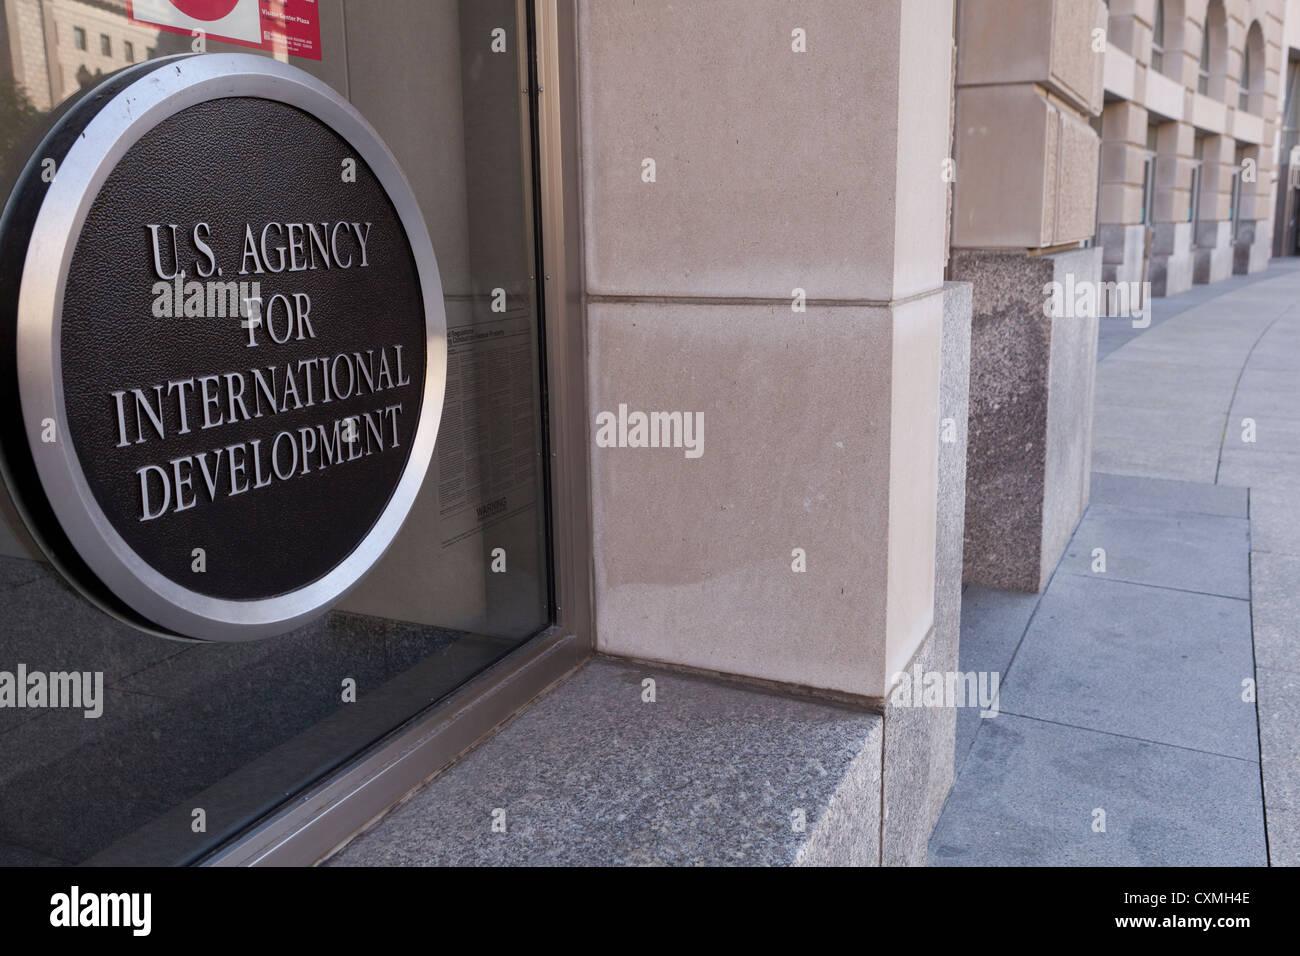 US Agency For International Development building entrance sign - Washington, DC USA - Stock Image